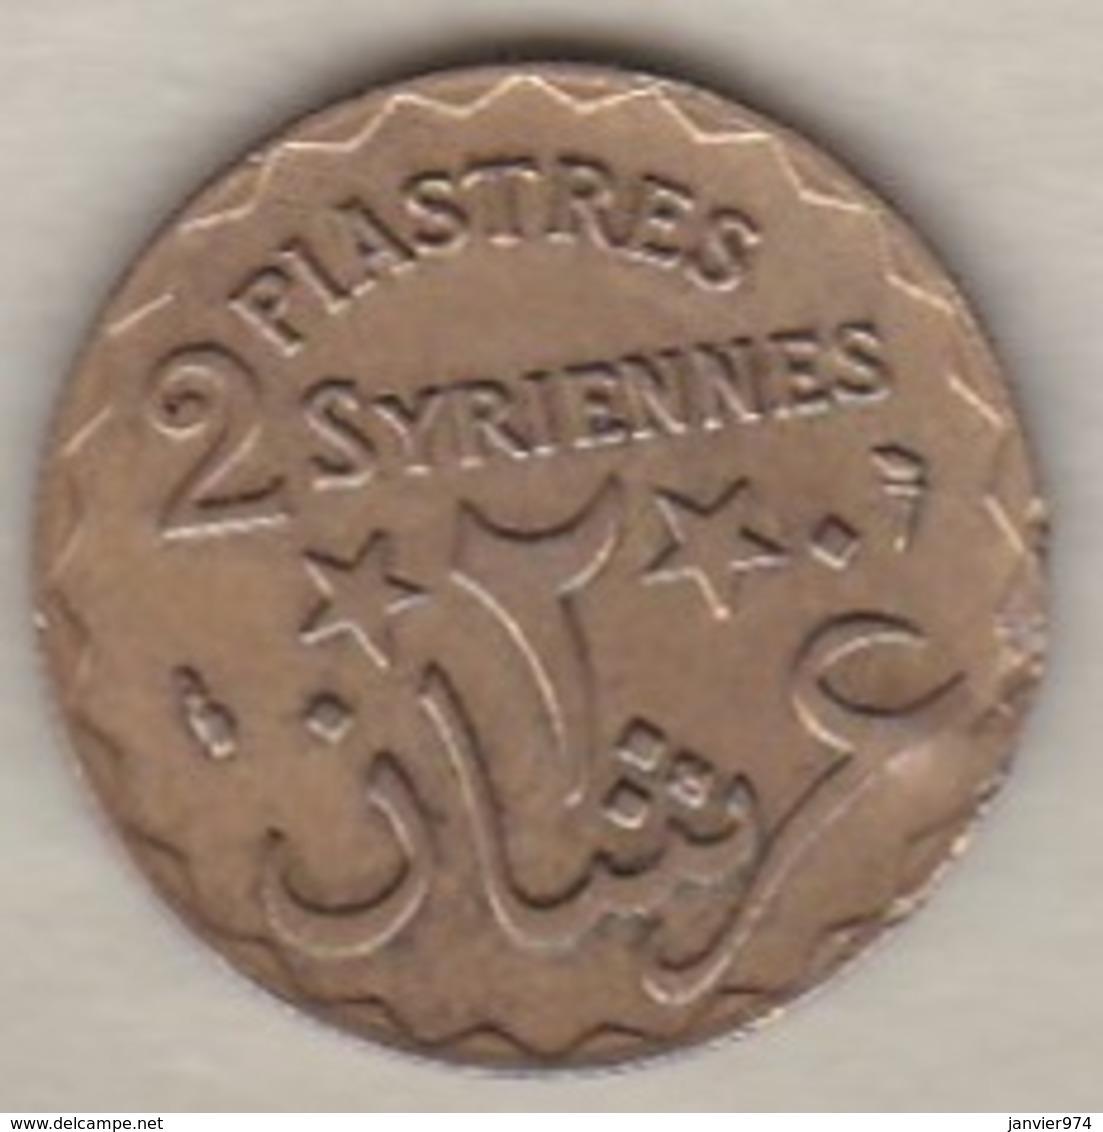 ETAT DU GRAND LIBAN. 2 PIASTRES SYRIENNES 1924 - Liban